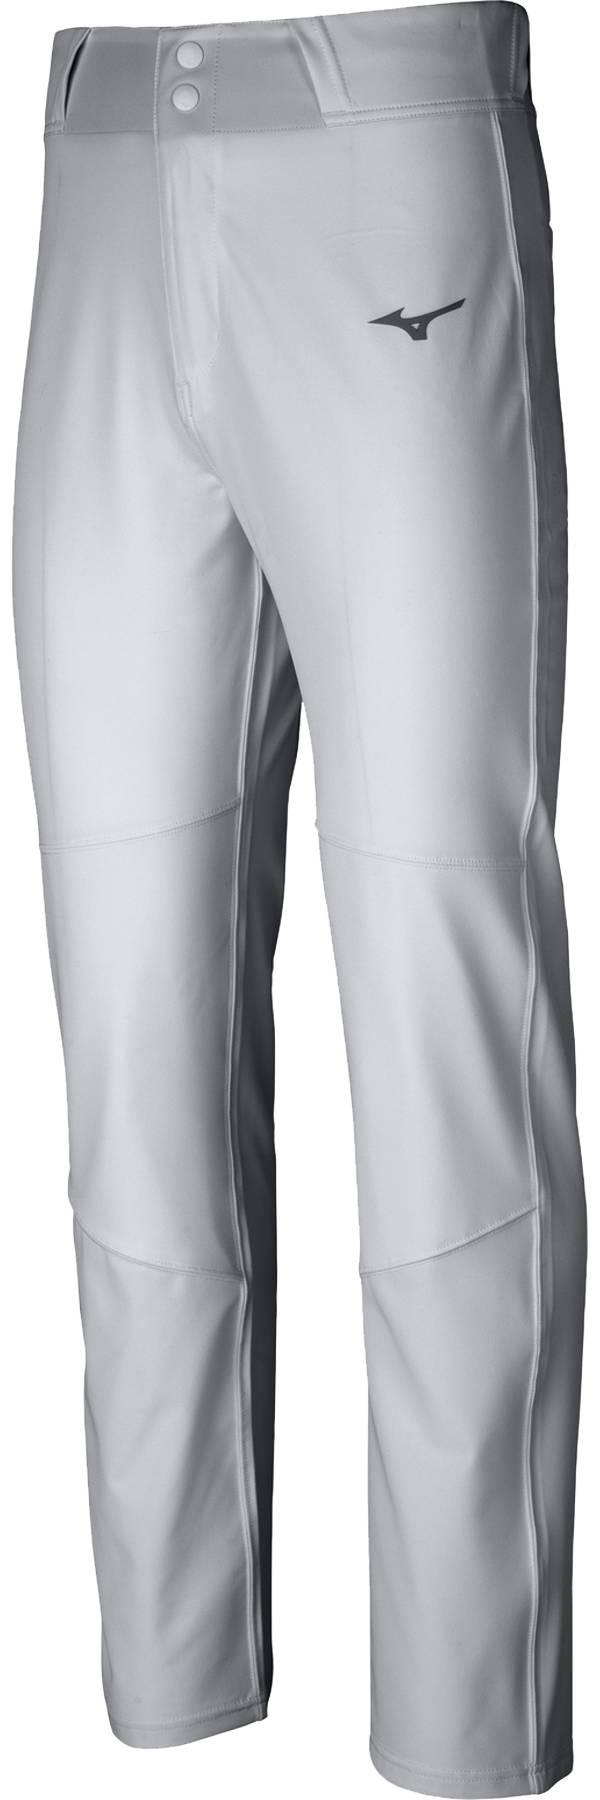 Mizuno Men's Pro Woven Baseball Pants product image